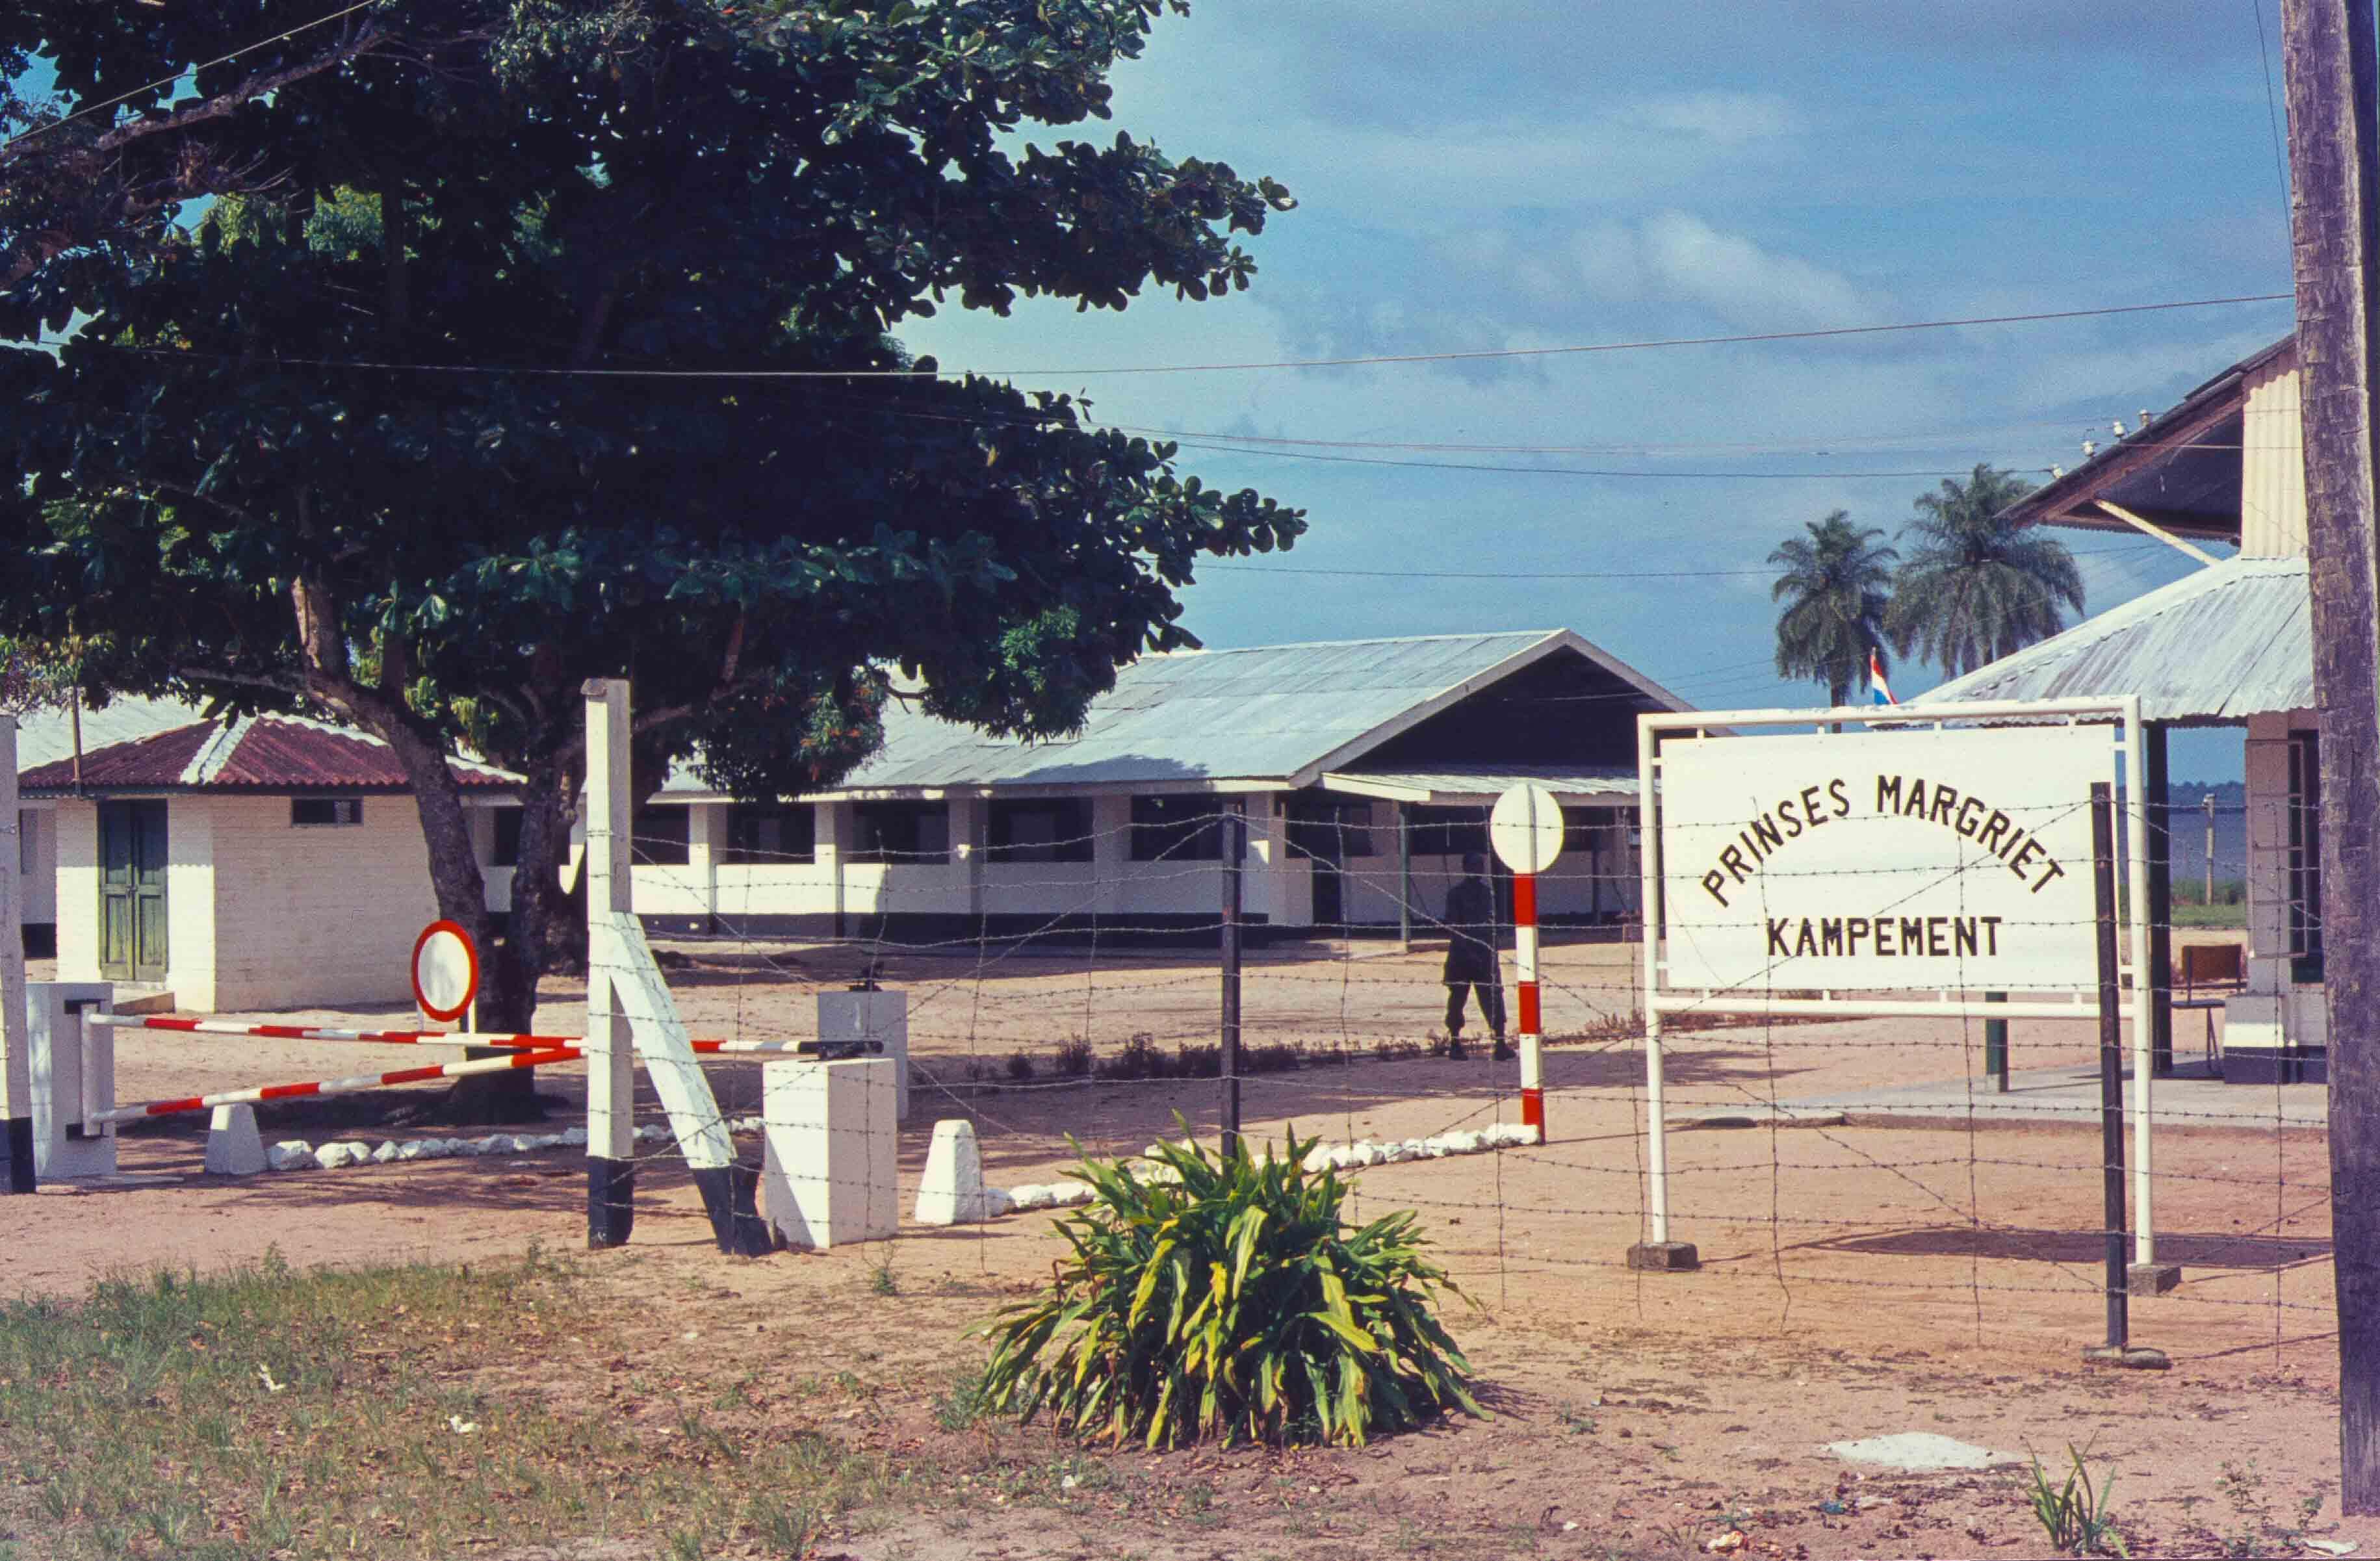 370. Suriname